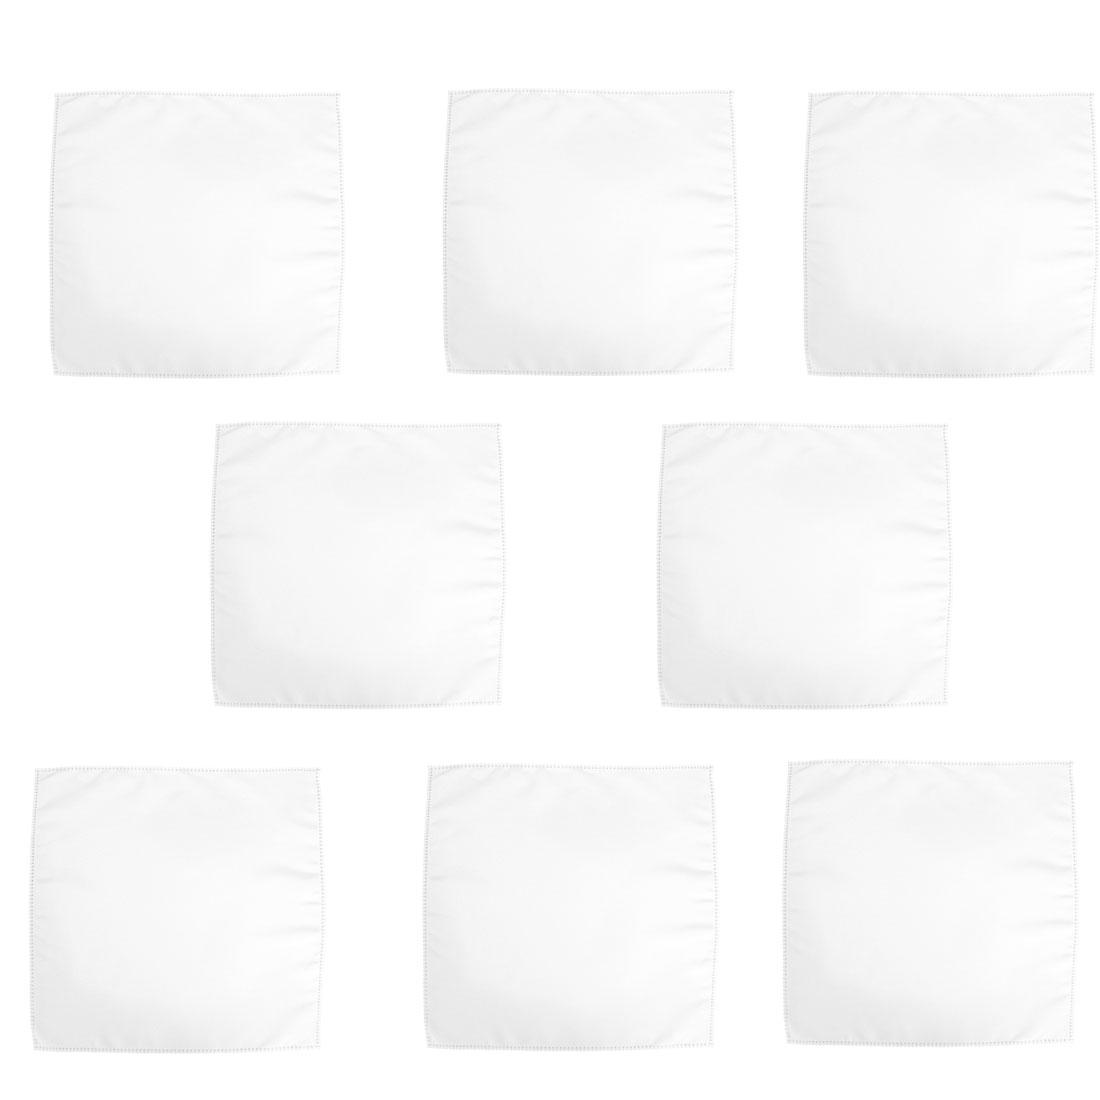 Square Table Glass Decor Placemat Dinner Cloth Napkin White 45cm x 45cm 8 Pcs